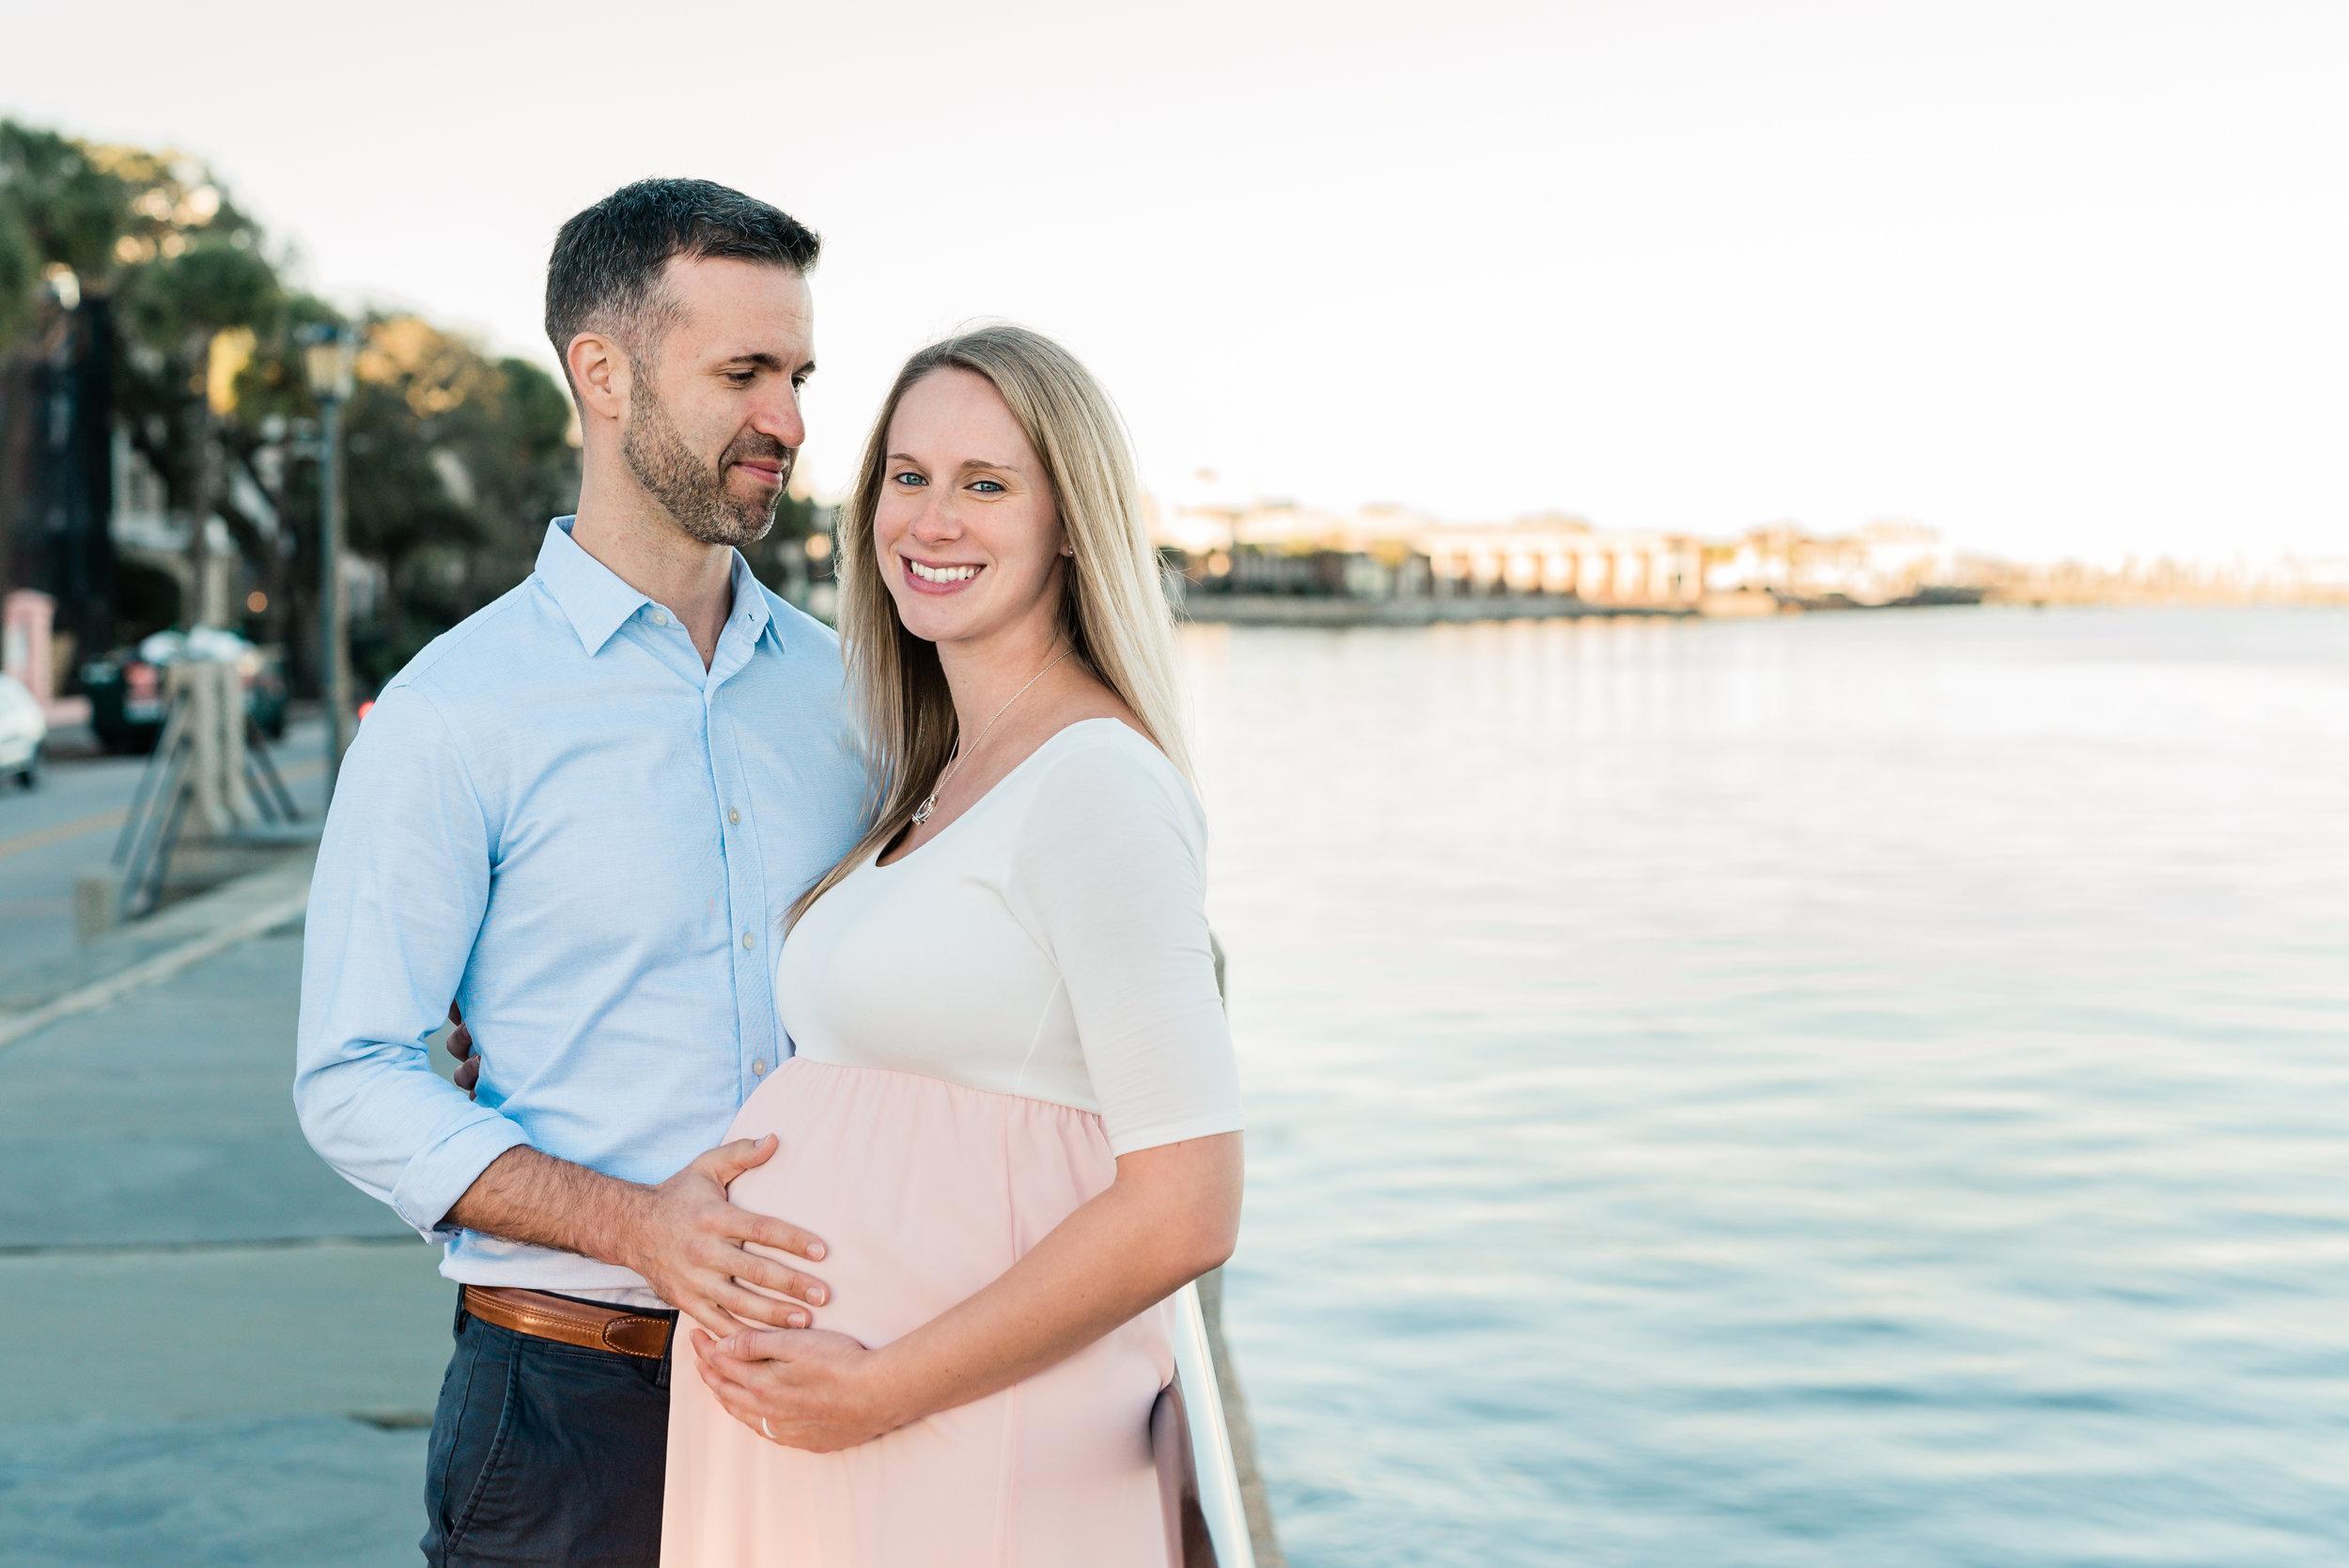 Charleston-Maternity-Photographer-FSP_8443 copy.jpg